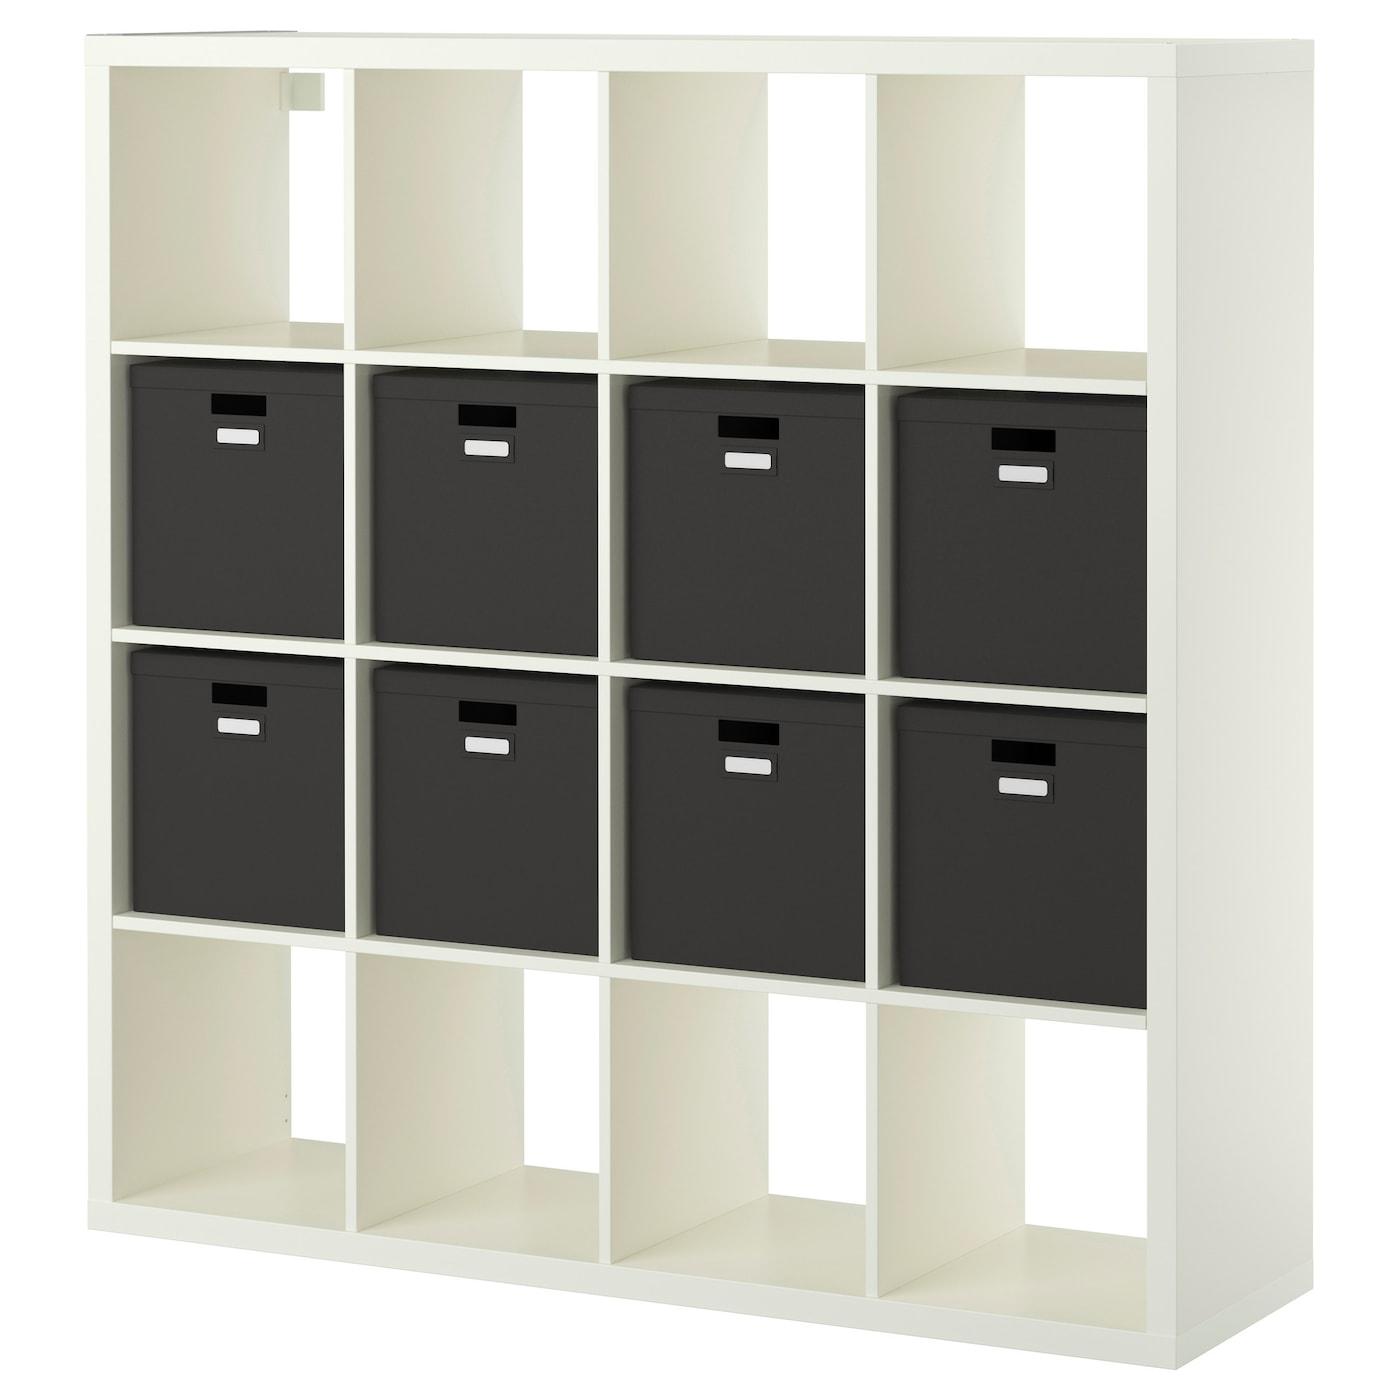 kallax shelving unit with 8 inserts white 147x147 cm ikea. Black Bedroom Furniture Sets. Home Design Ideas